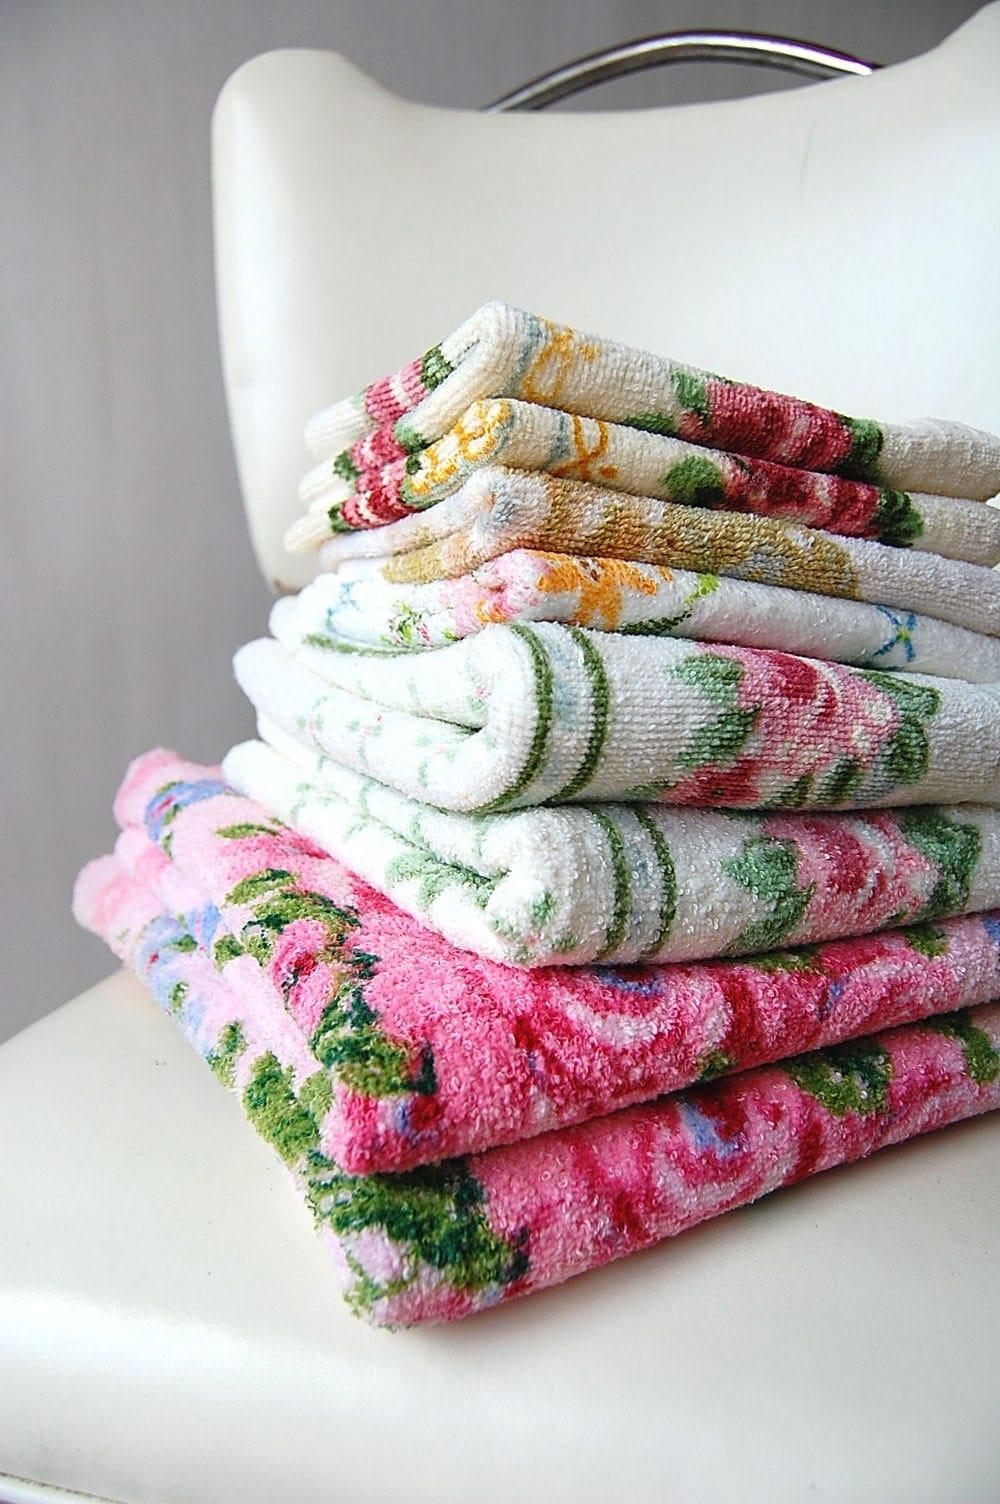 Reserved Vintage Floral Towels Hand Towels And Washcloths